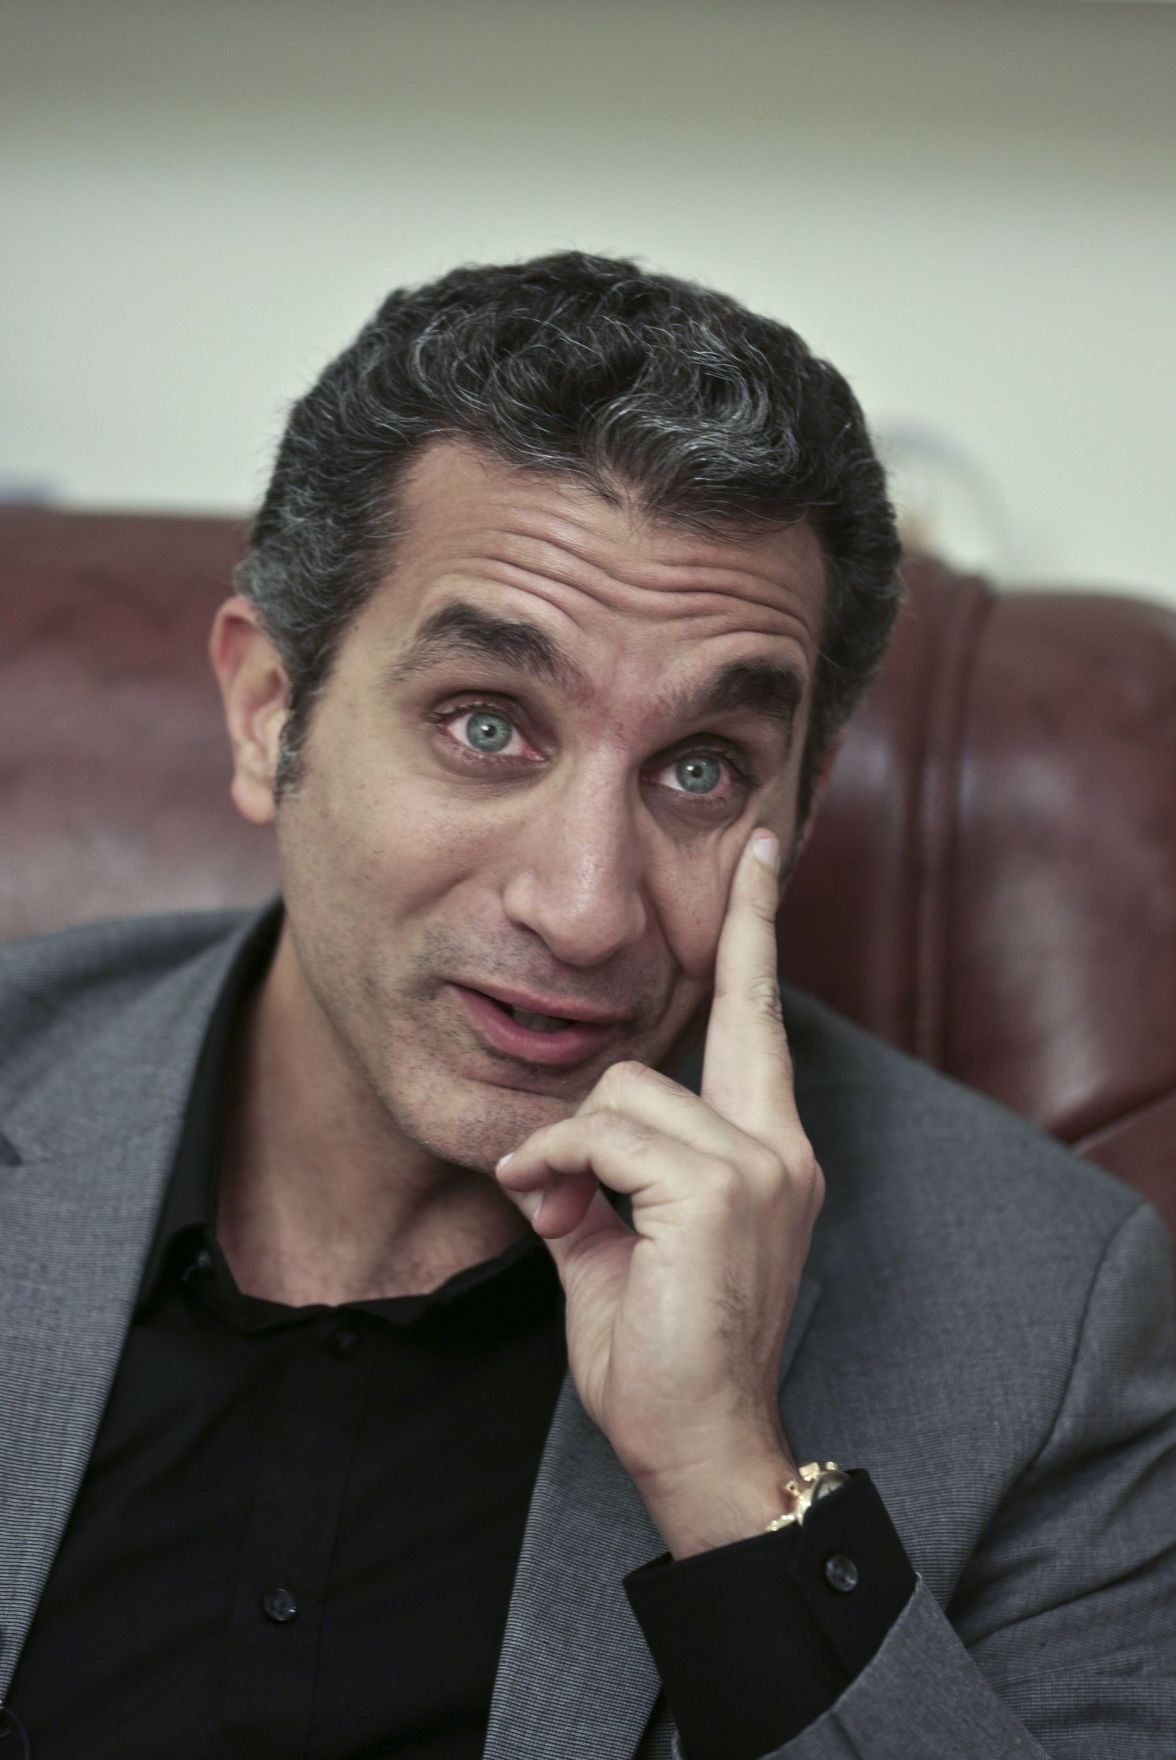 Egypt's most popular satirist prepares return to TV